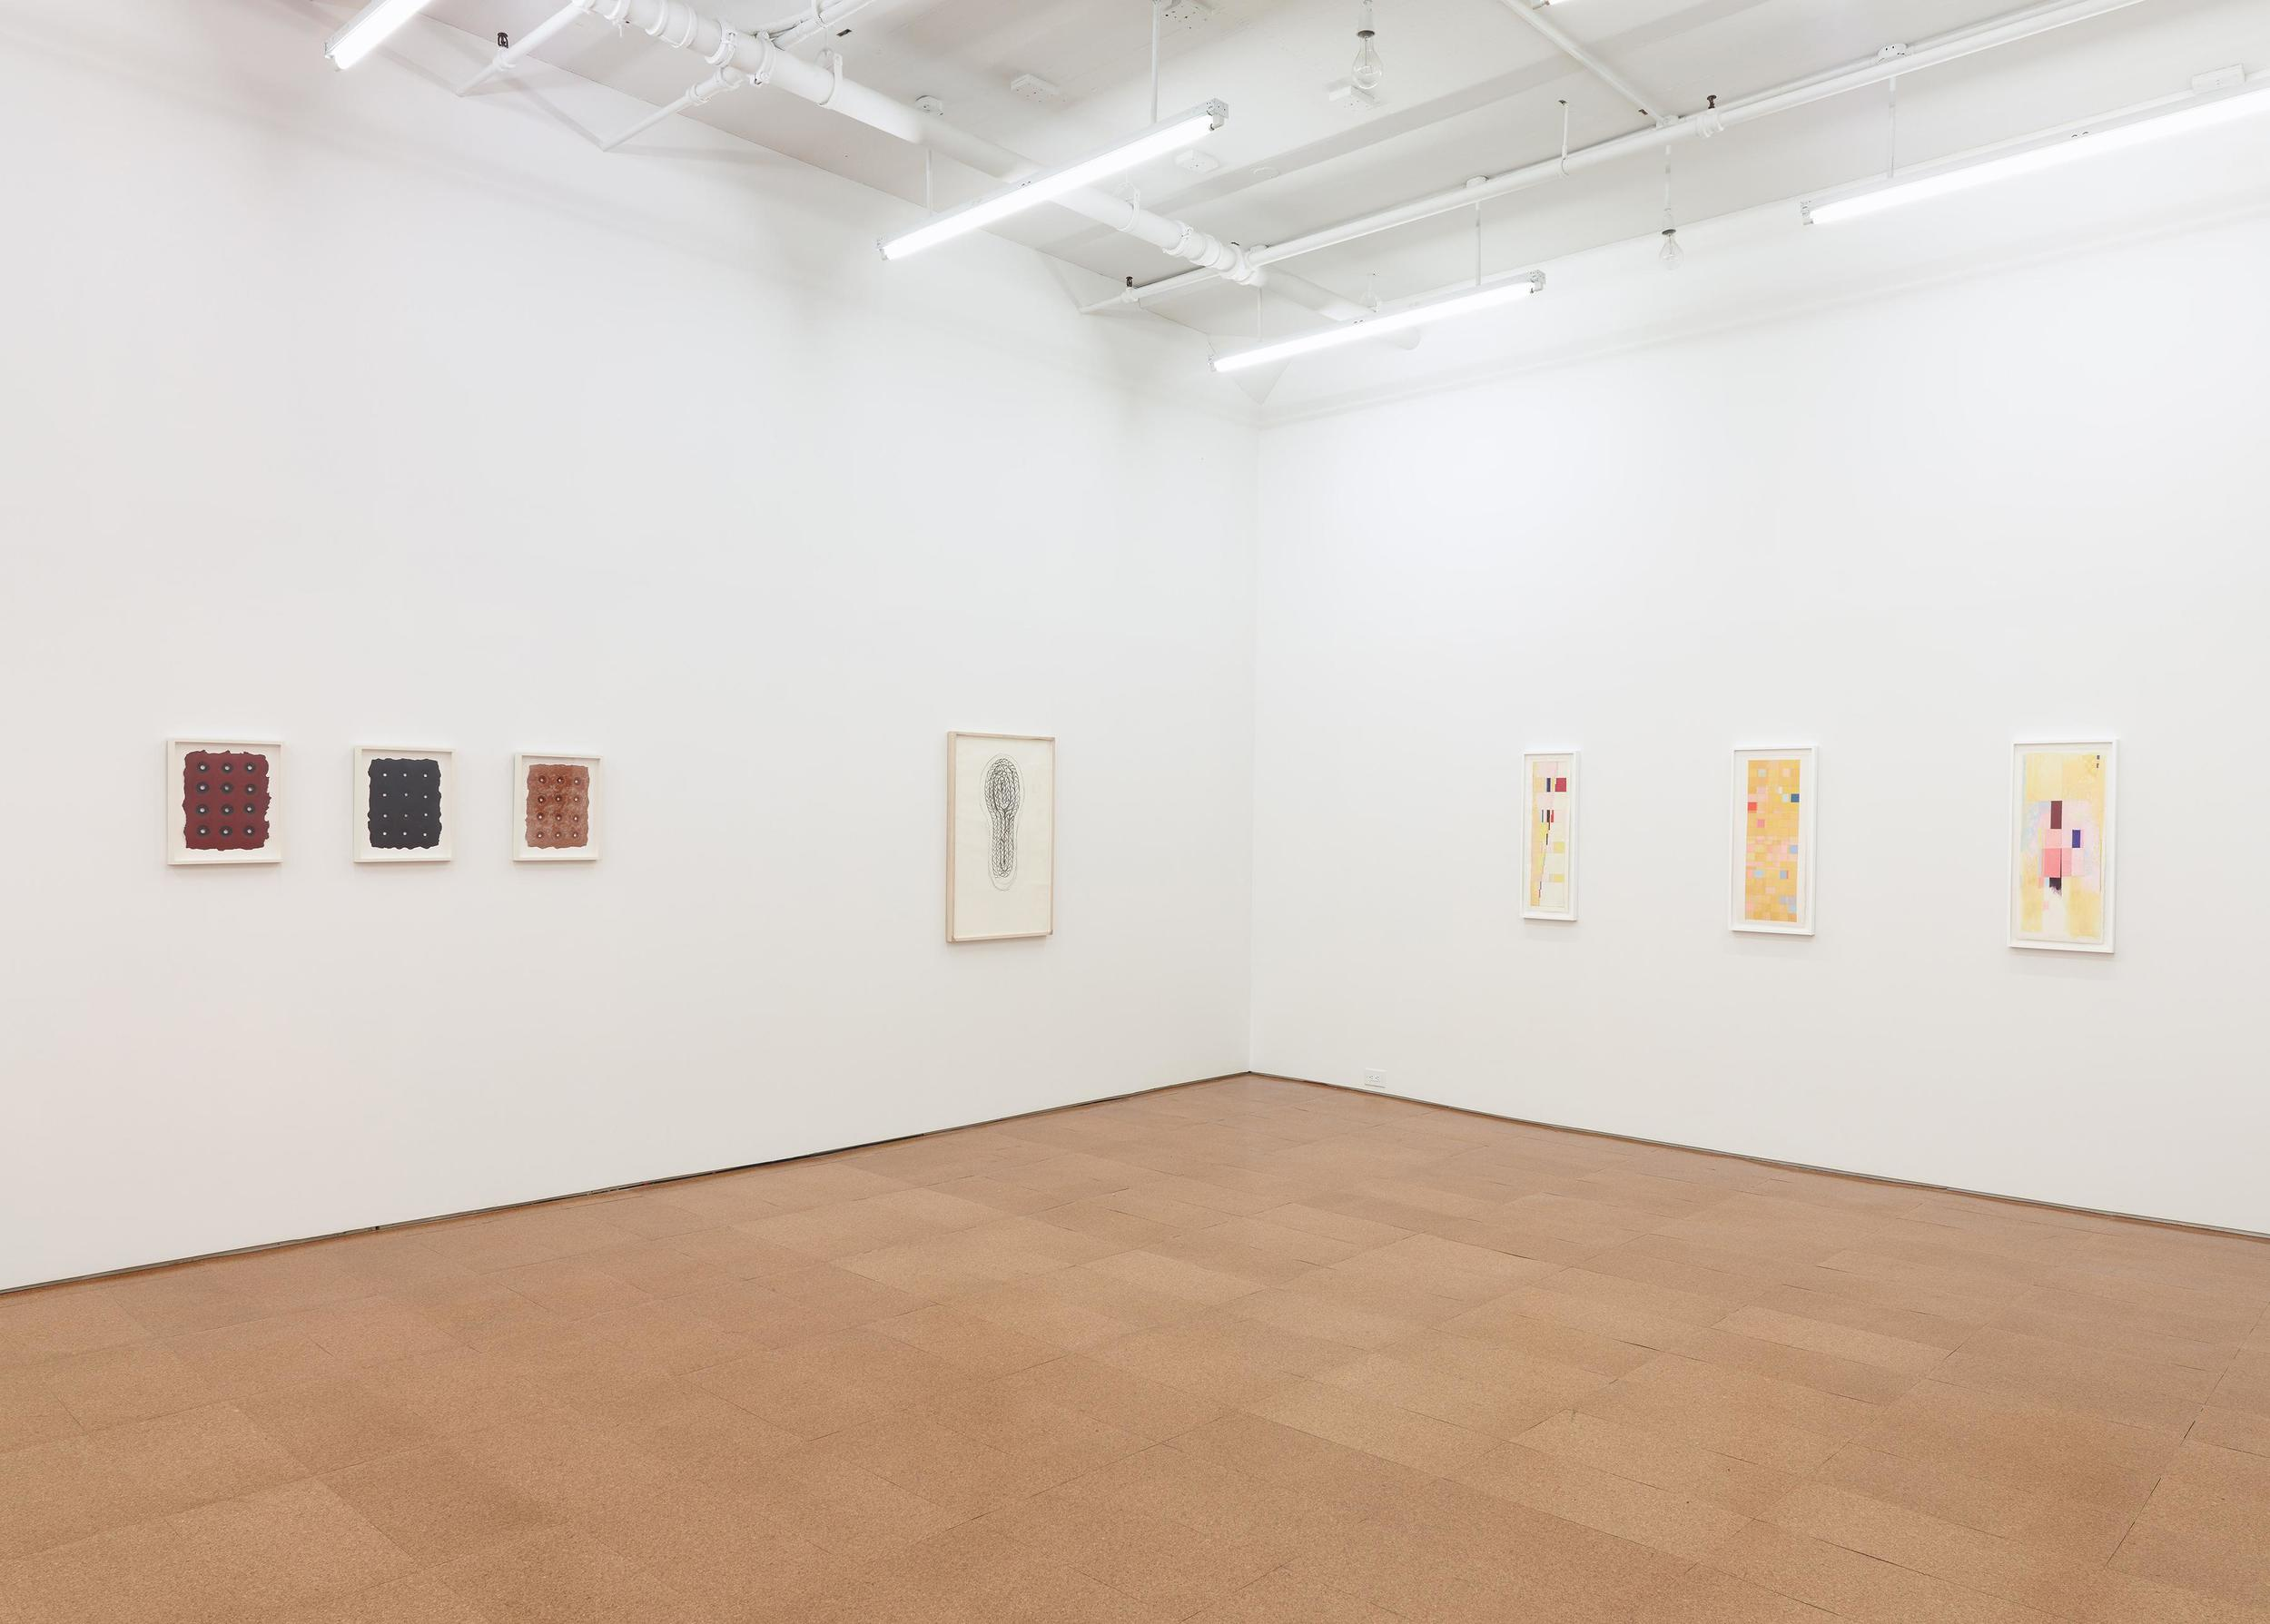 2013: Broken Spaces, at Alexander Gray Associates, New York